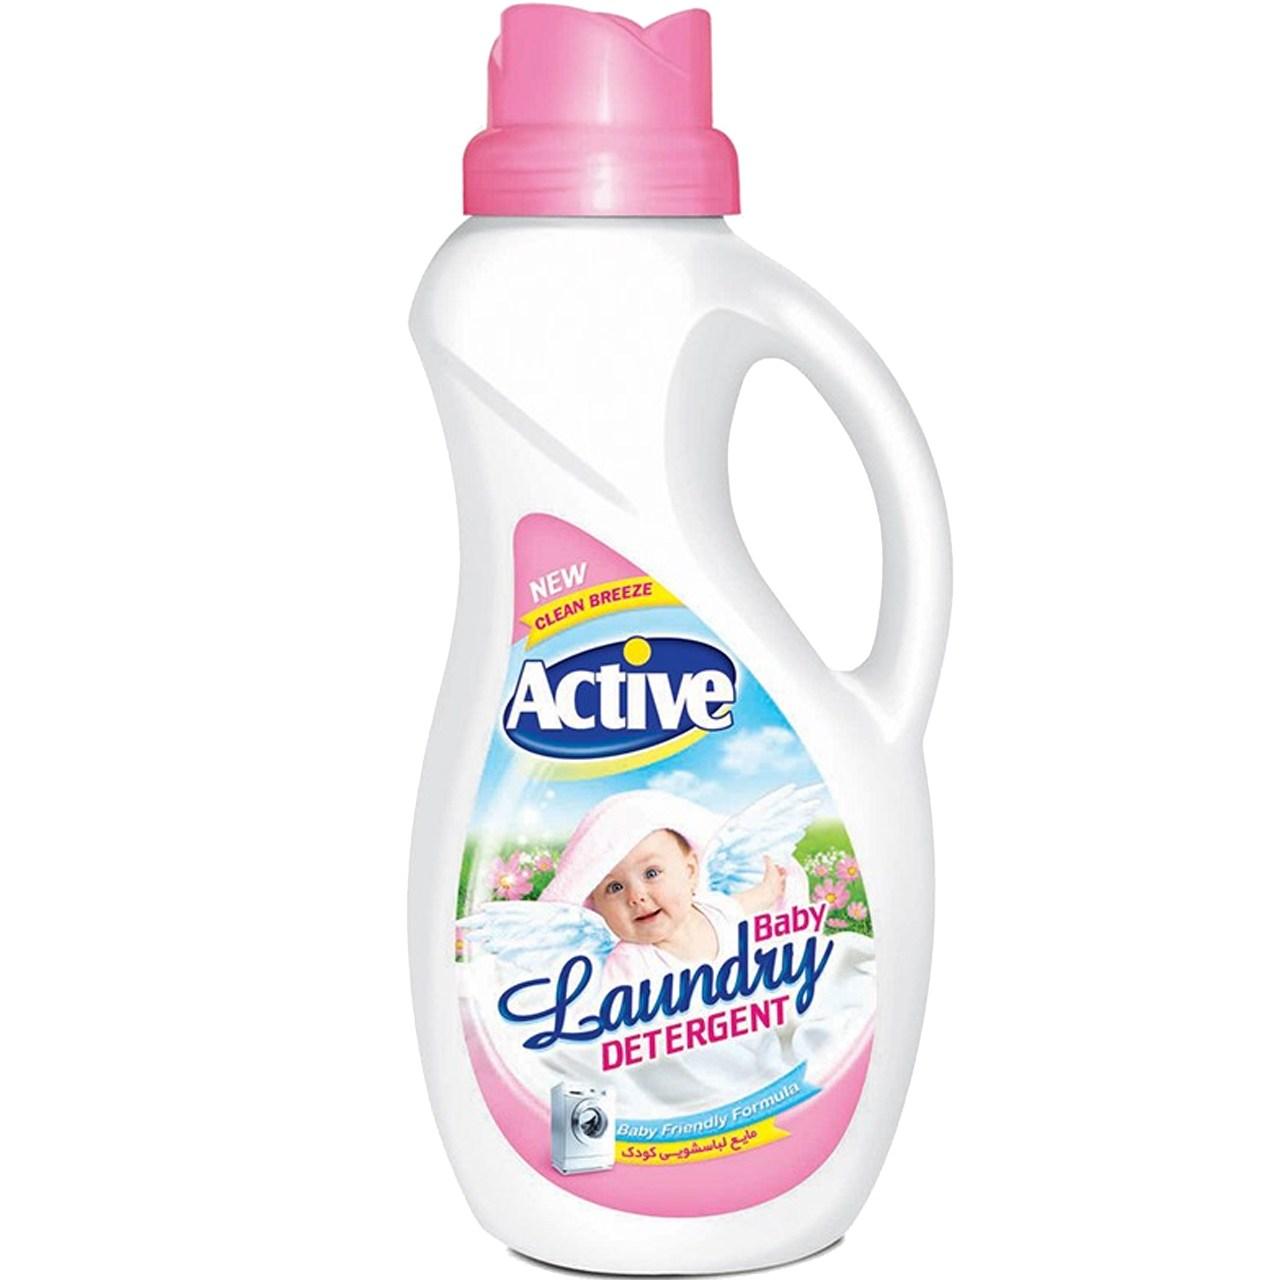 خرید                     مایع لباسشویی صورتی اکتیو مخصوص کودک حجم 1500 میلی لیتر